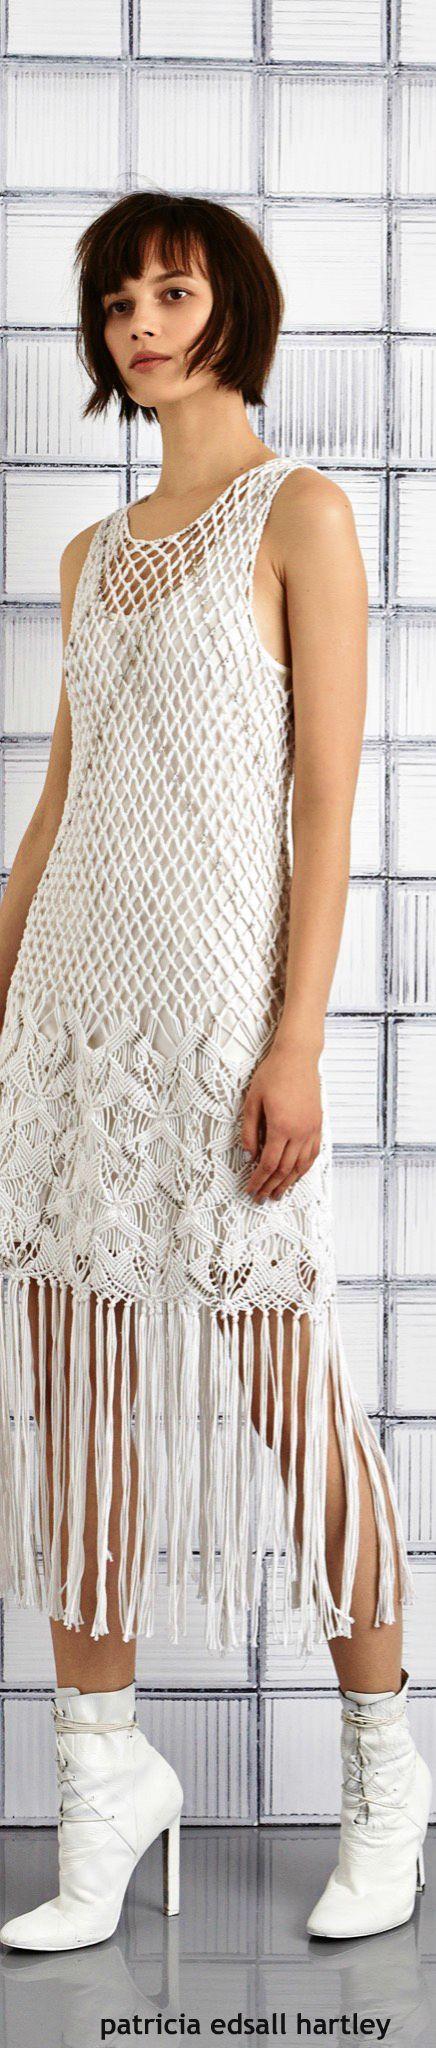 -White Crochet Dress - Tess Giberson Resort-2016.<3